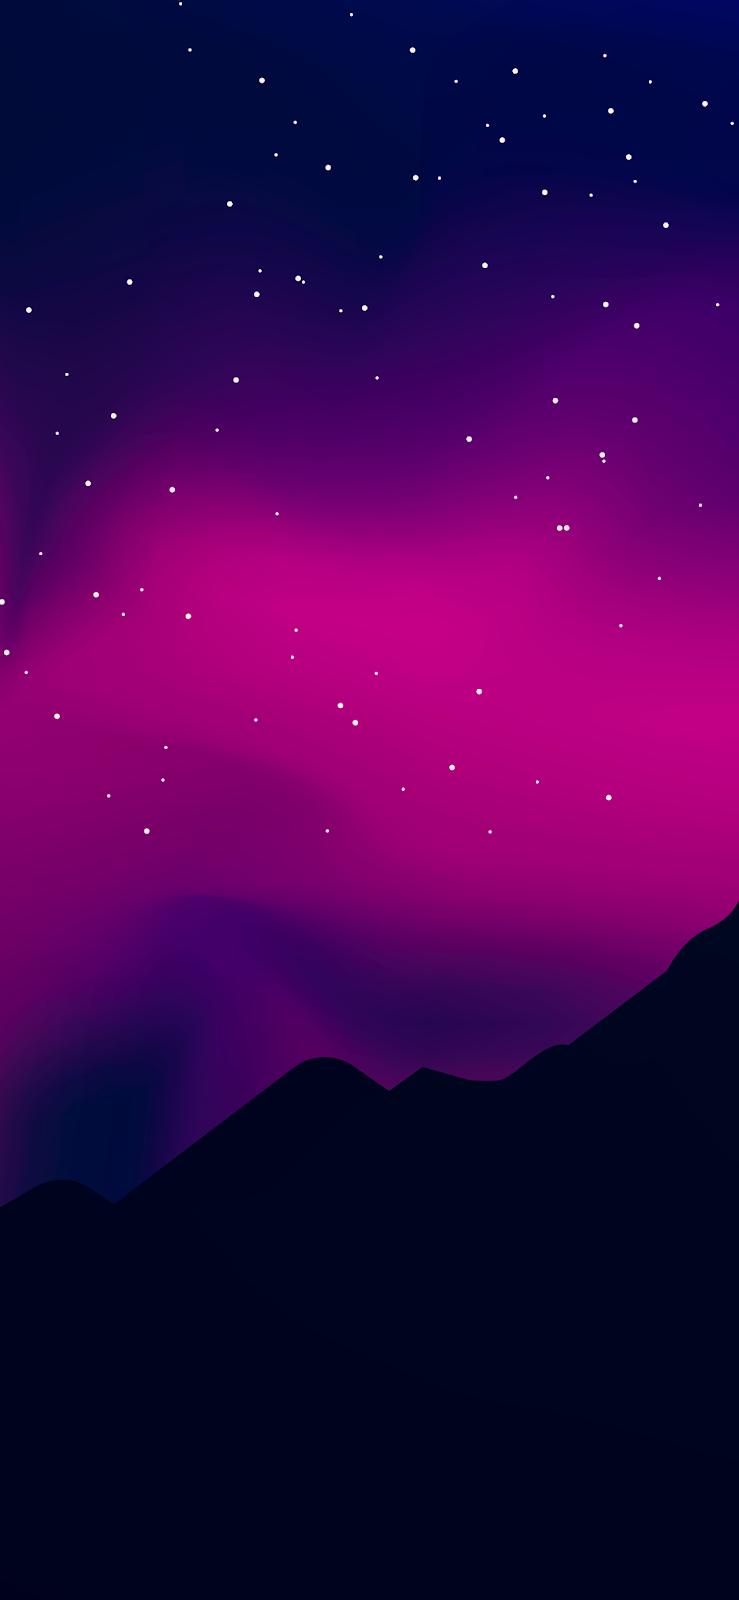 Sunset in the mountain by EvgeniyZemelko